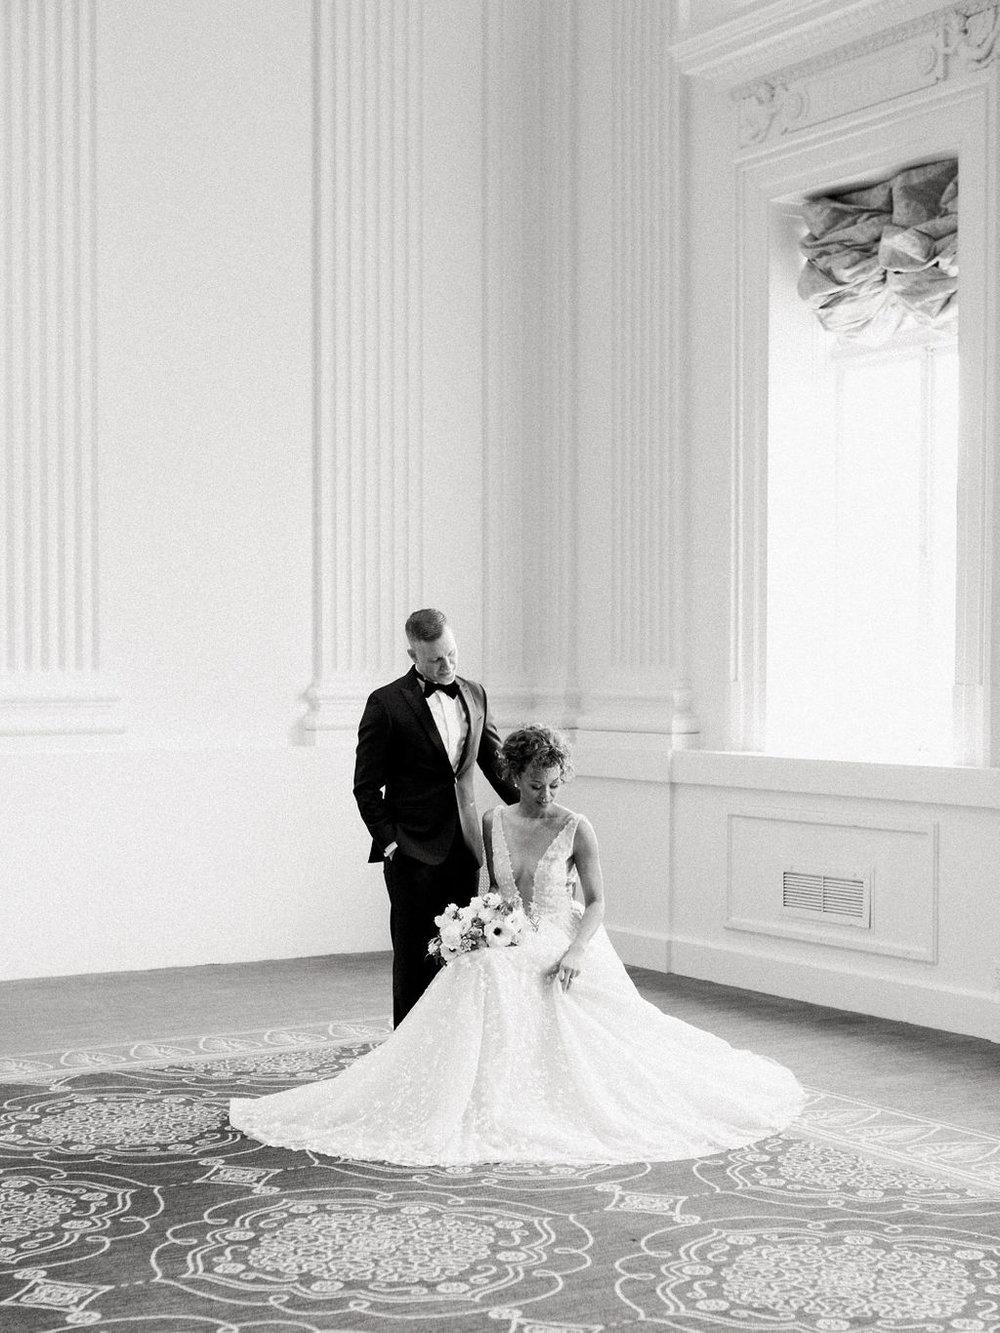 Carlos-Hernandez-Wedding-Film-Photography-122.jpg